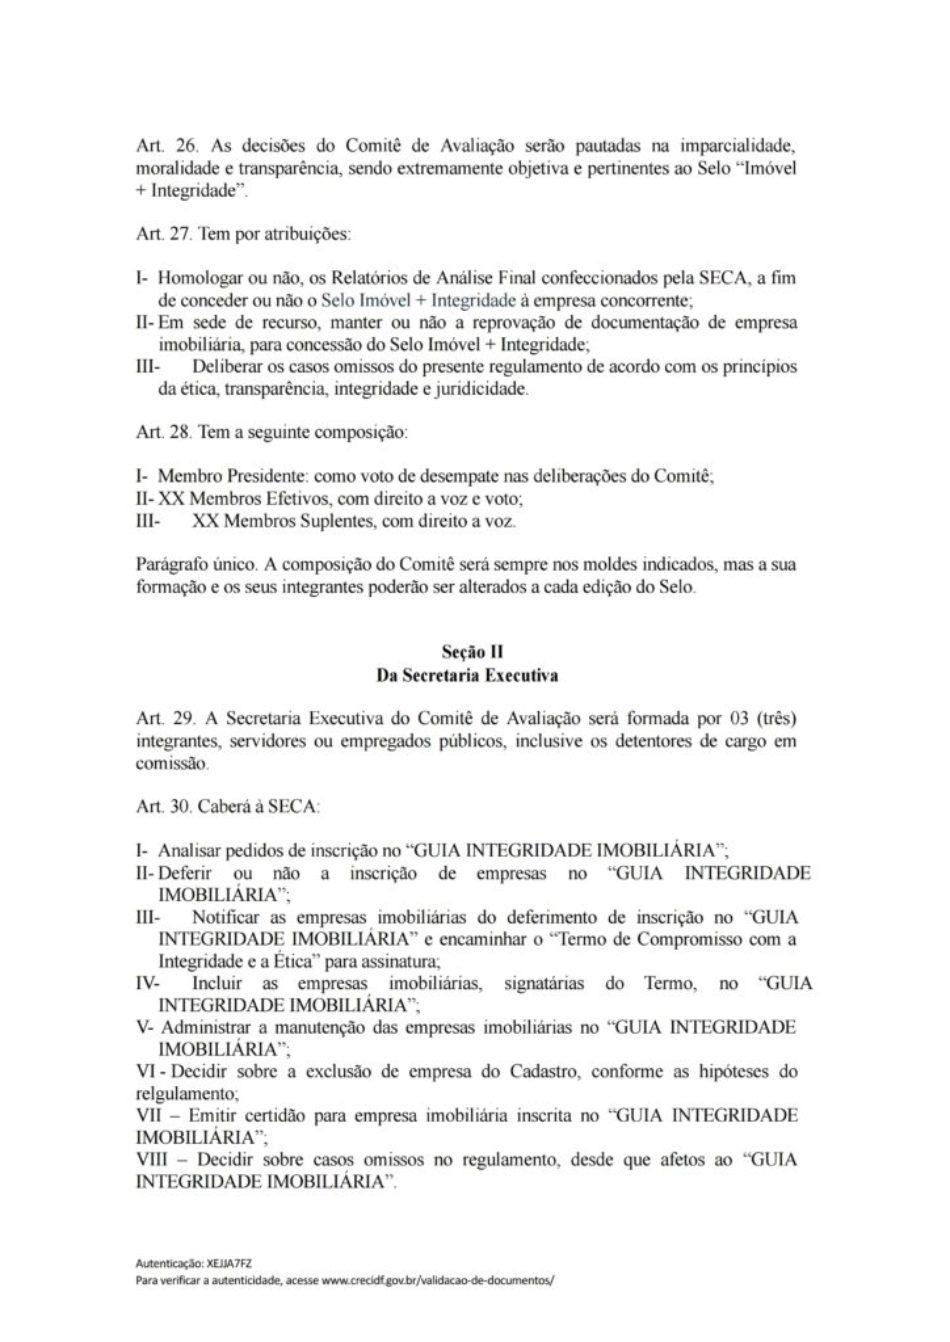 PORTARIA Nº 58 - SELO IMÓVEL + INTEGRIDADE.pdf_page_09